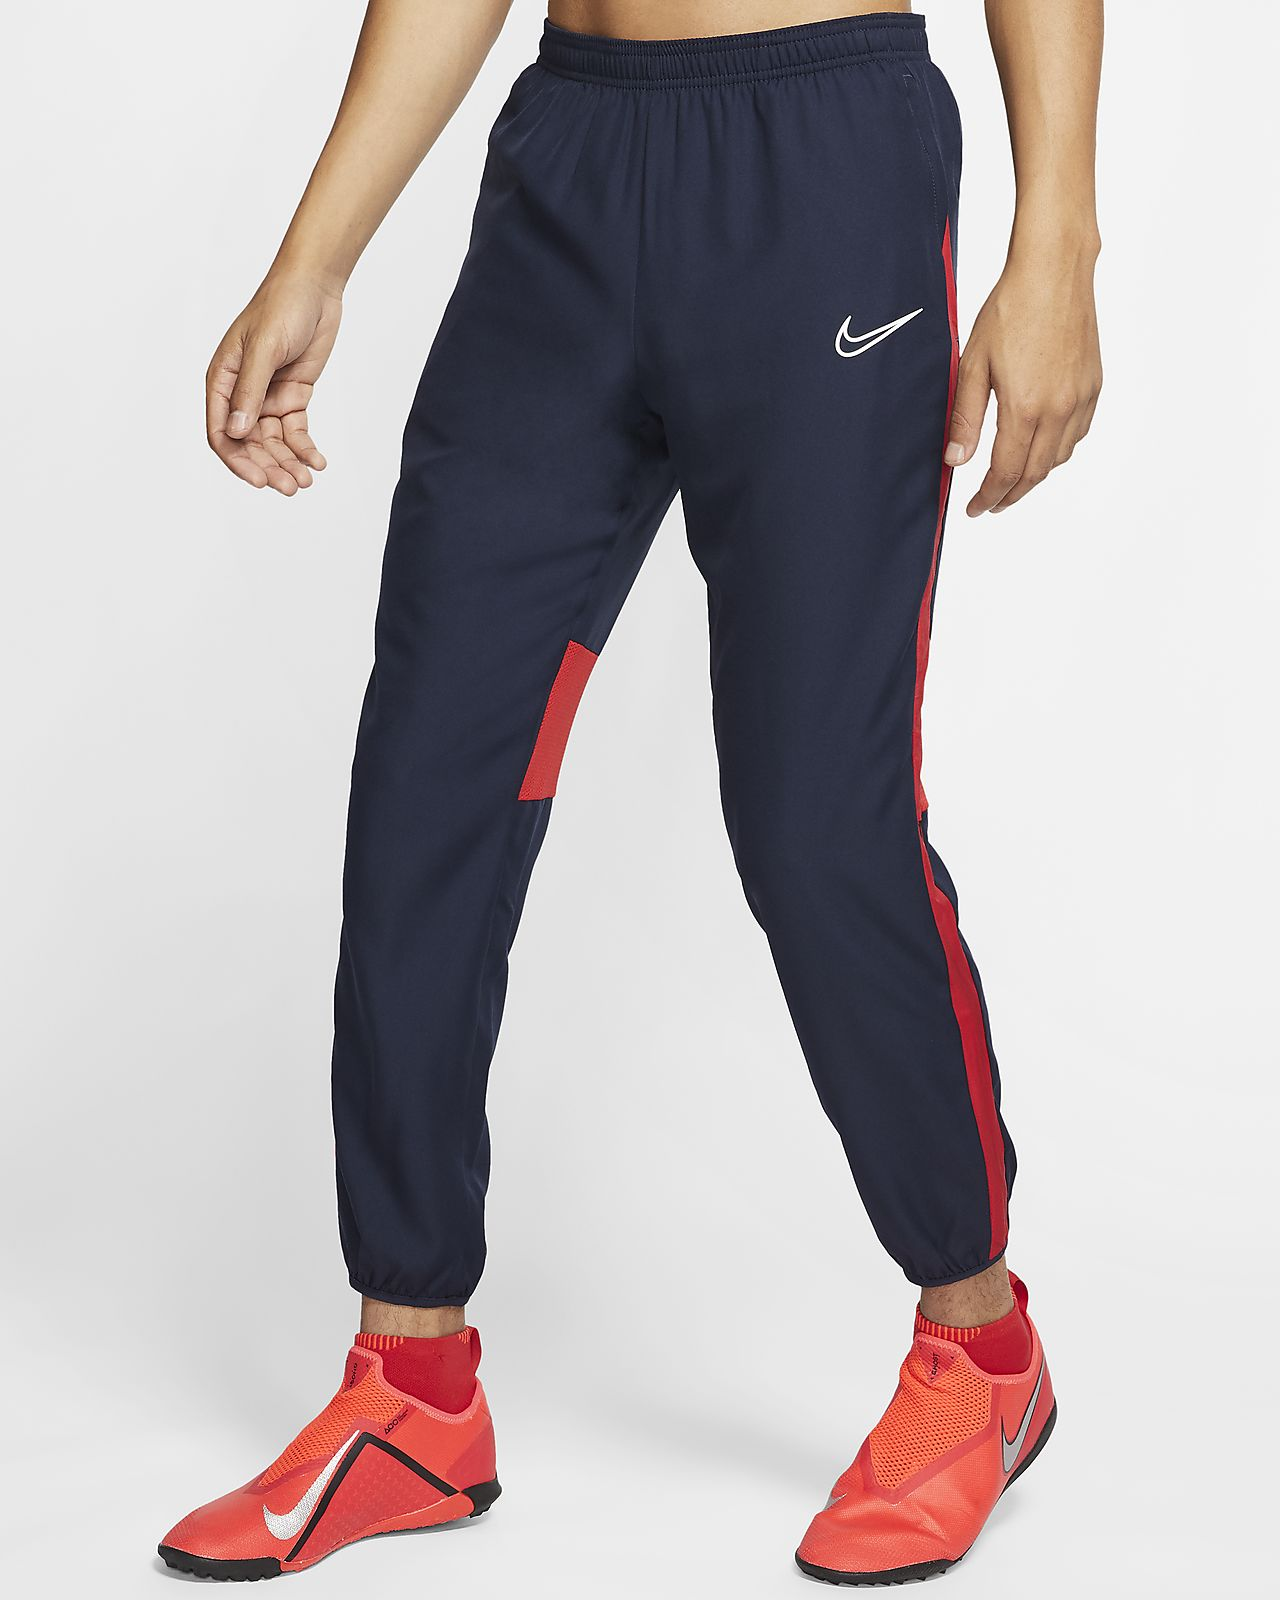 Nike Dri FIT Academy fodboldbukser til mænd